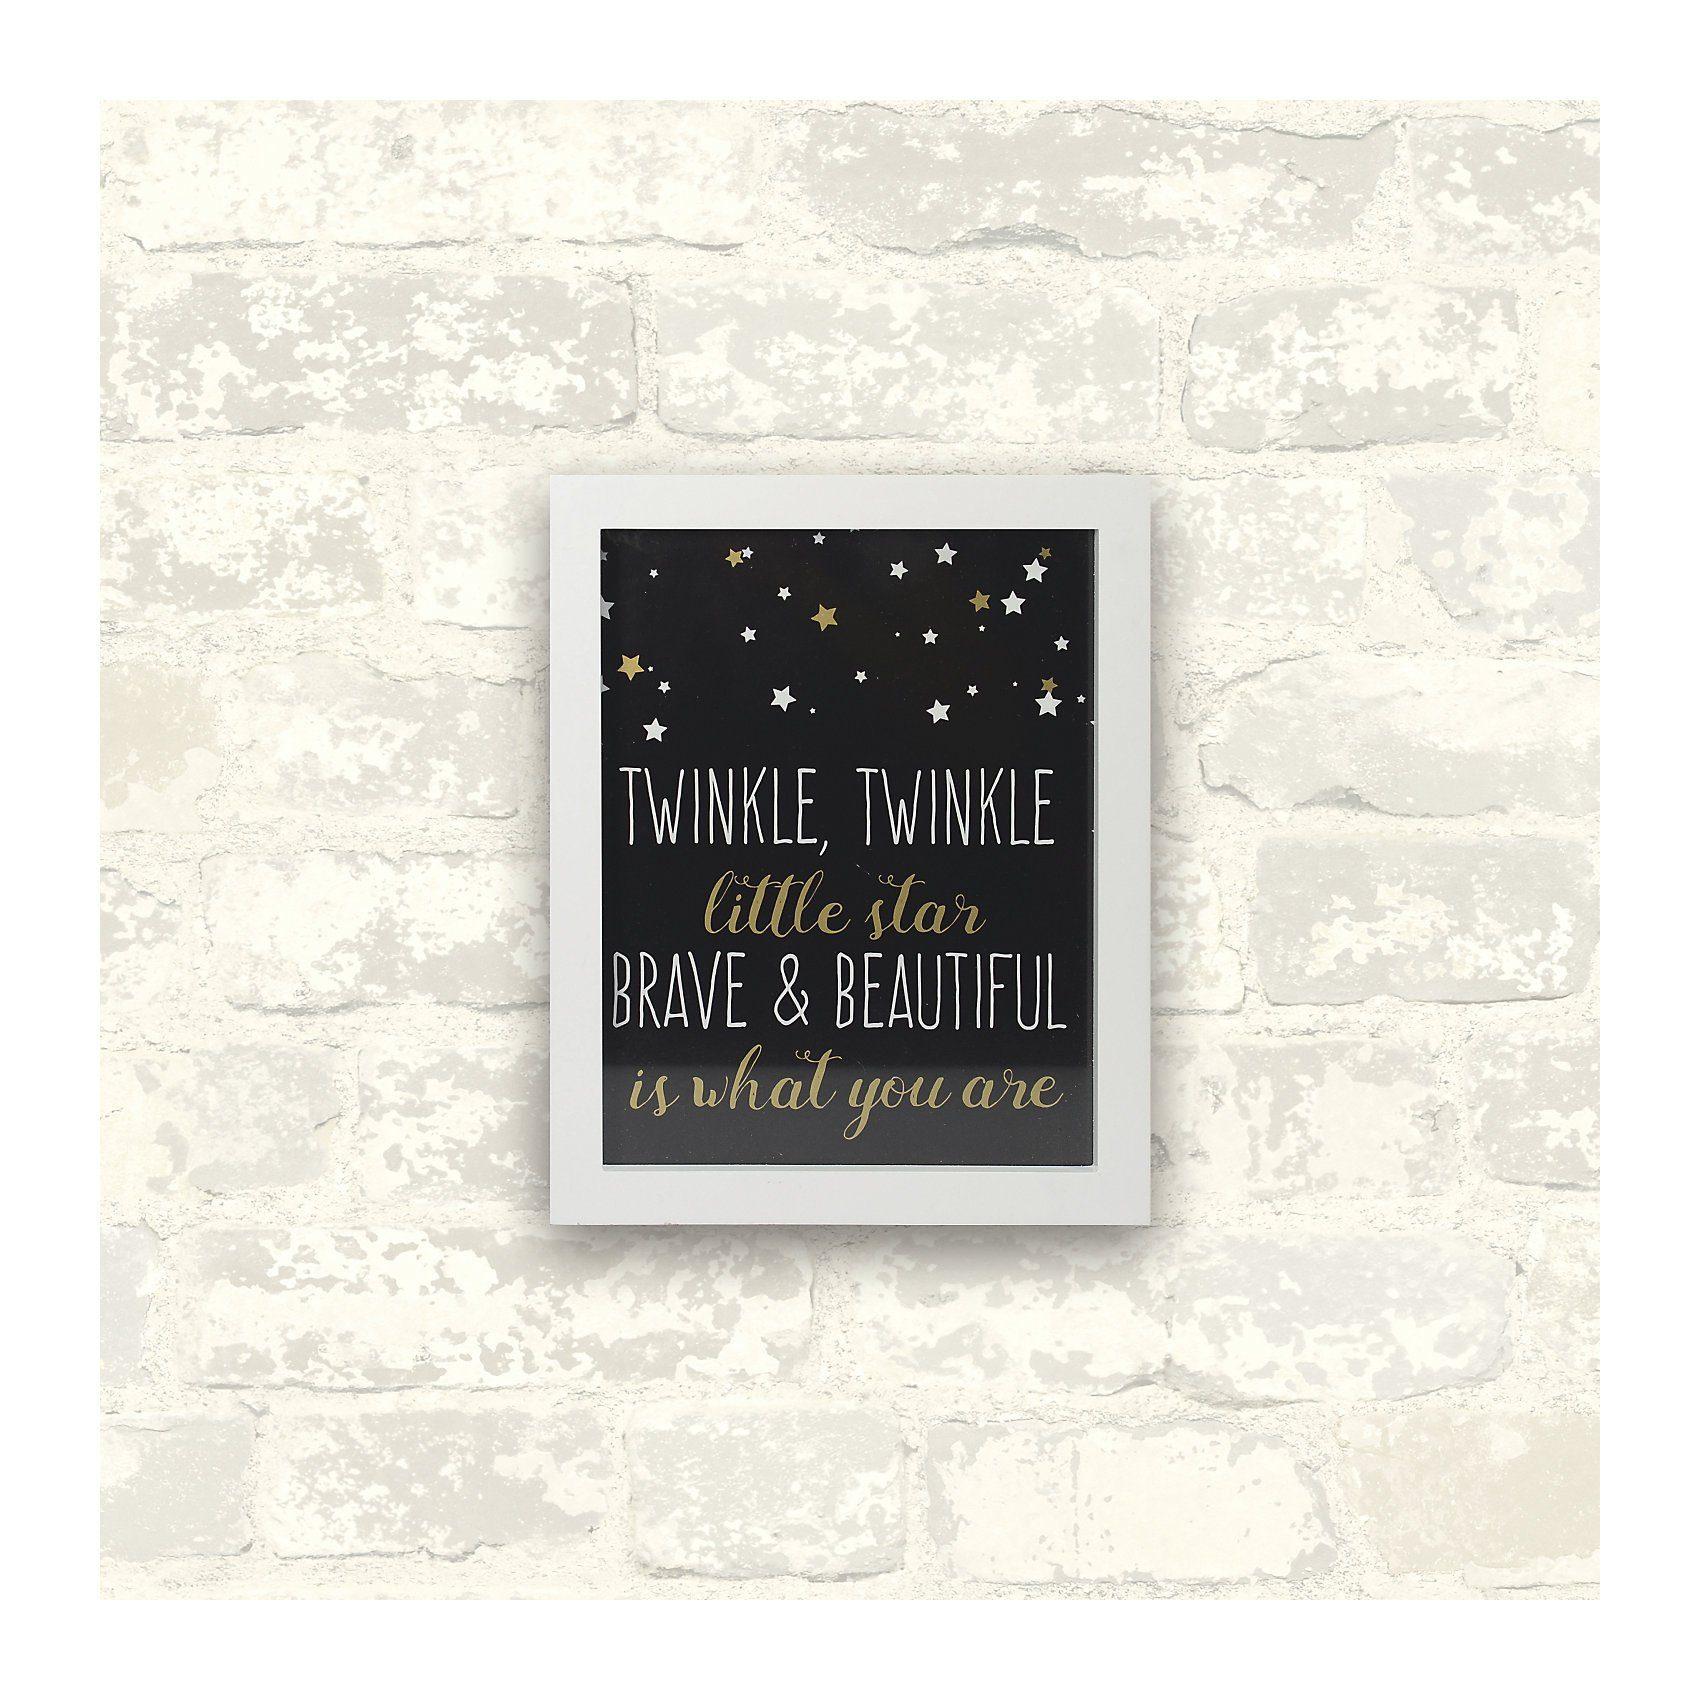 RoomMates Wandbild mit Schriftzug, Brave & Beautiful, schwarz, 8 x 10